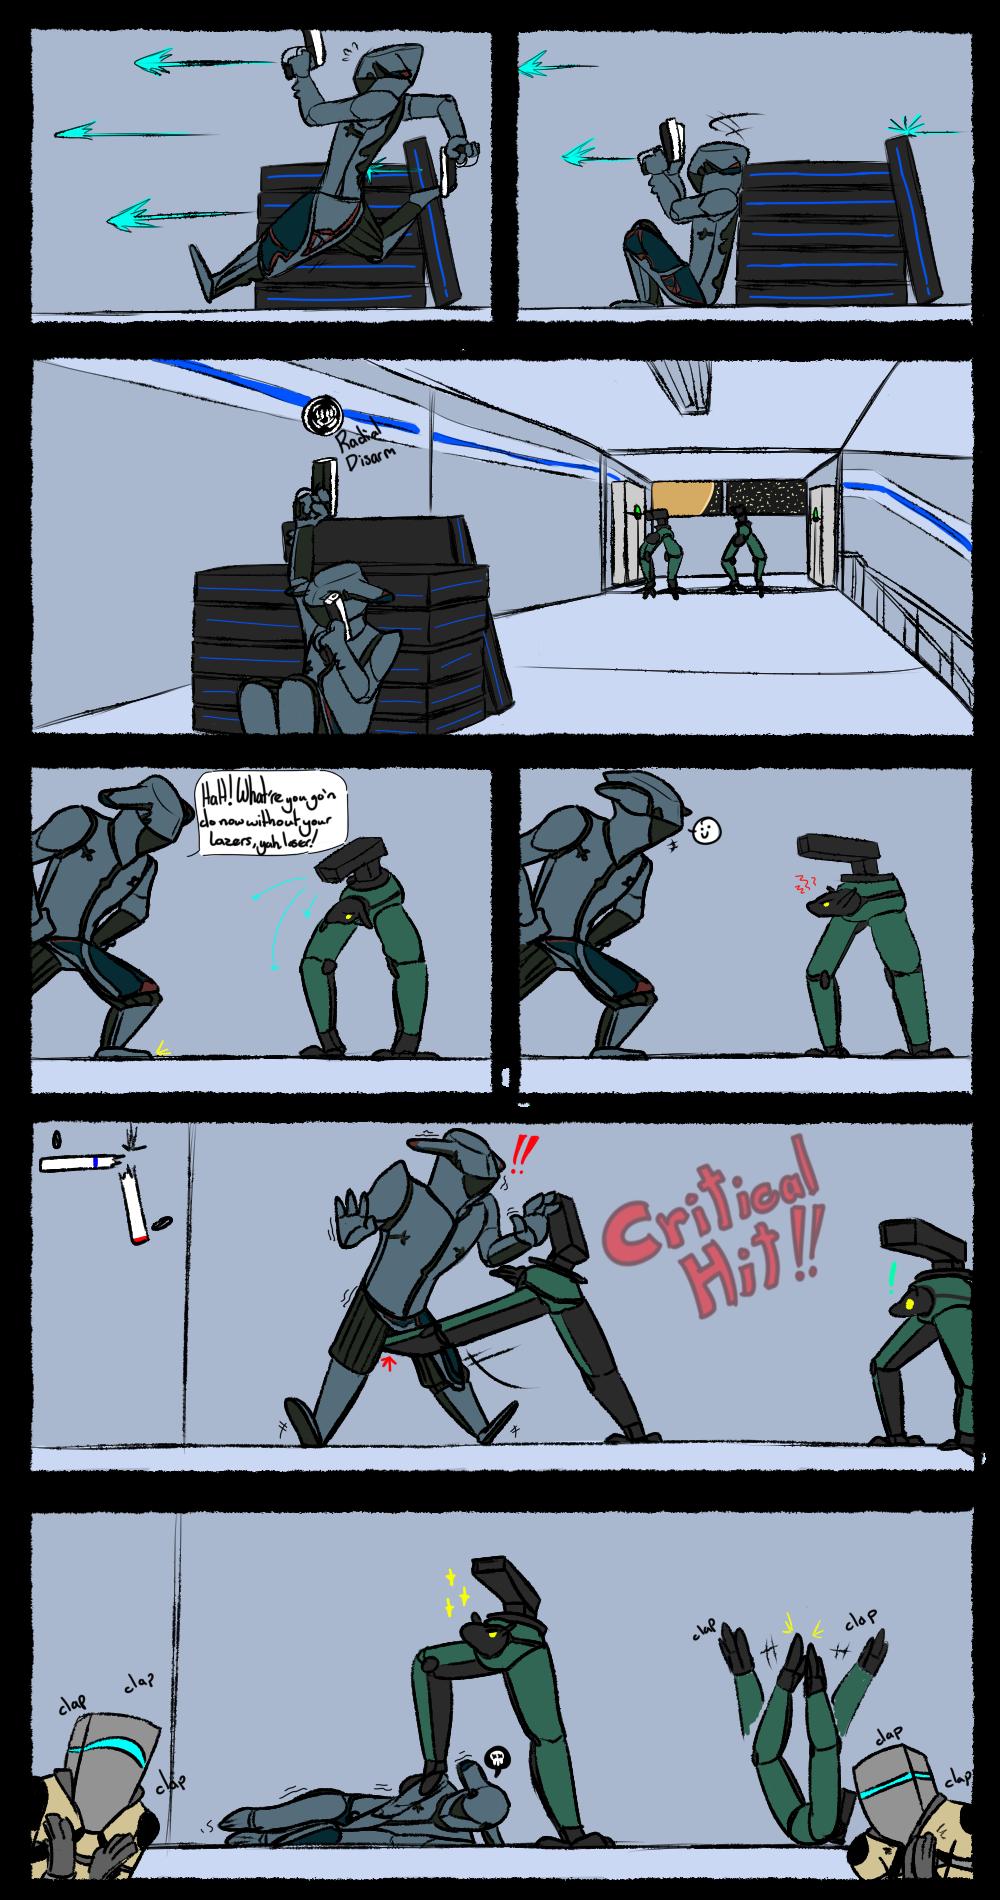 Moa S Can Kick By Thetvhead On Deviantart Funny Games Warframe